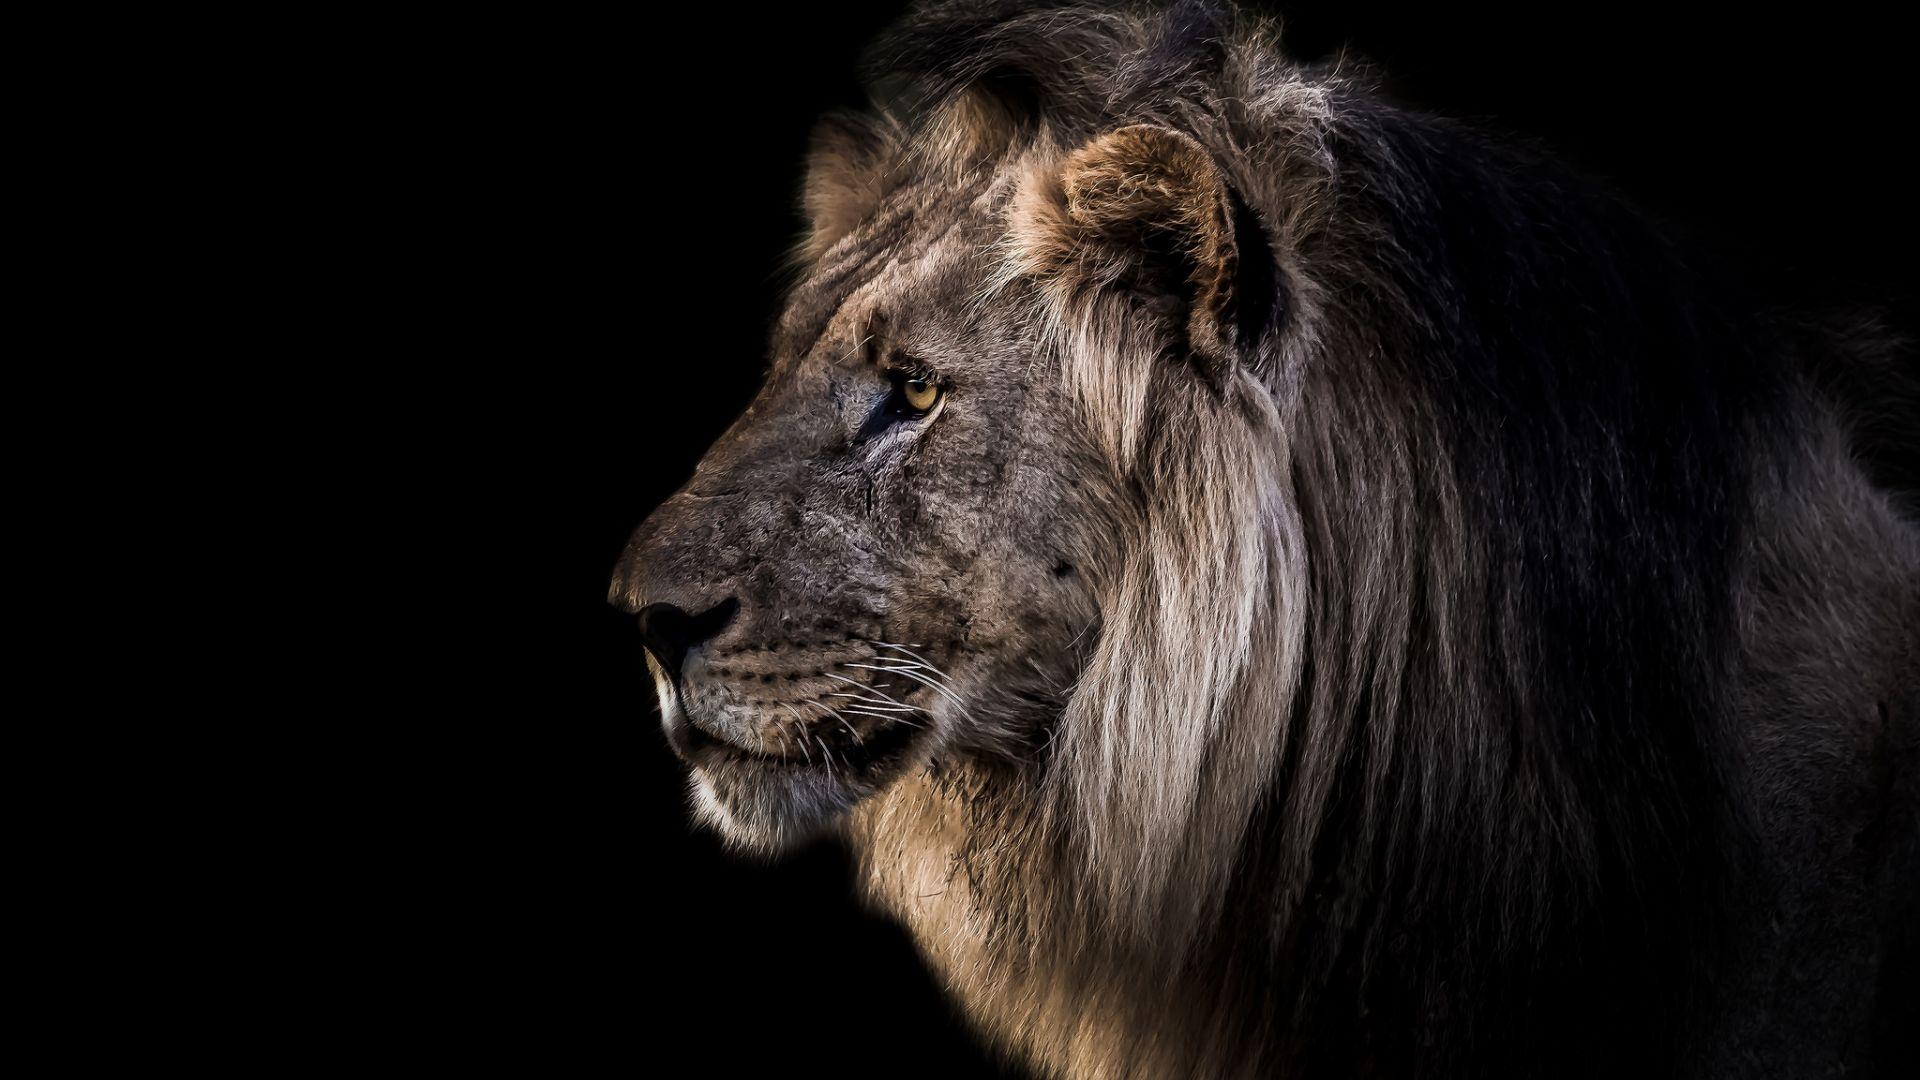 Wallpaper Lion muzzle, furry animal, predator